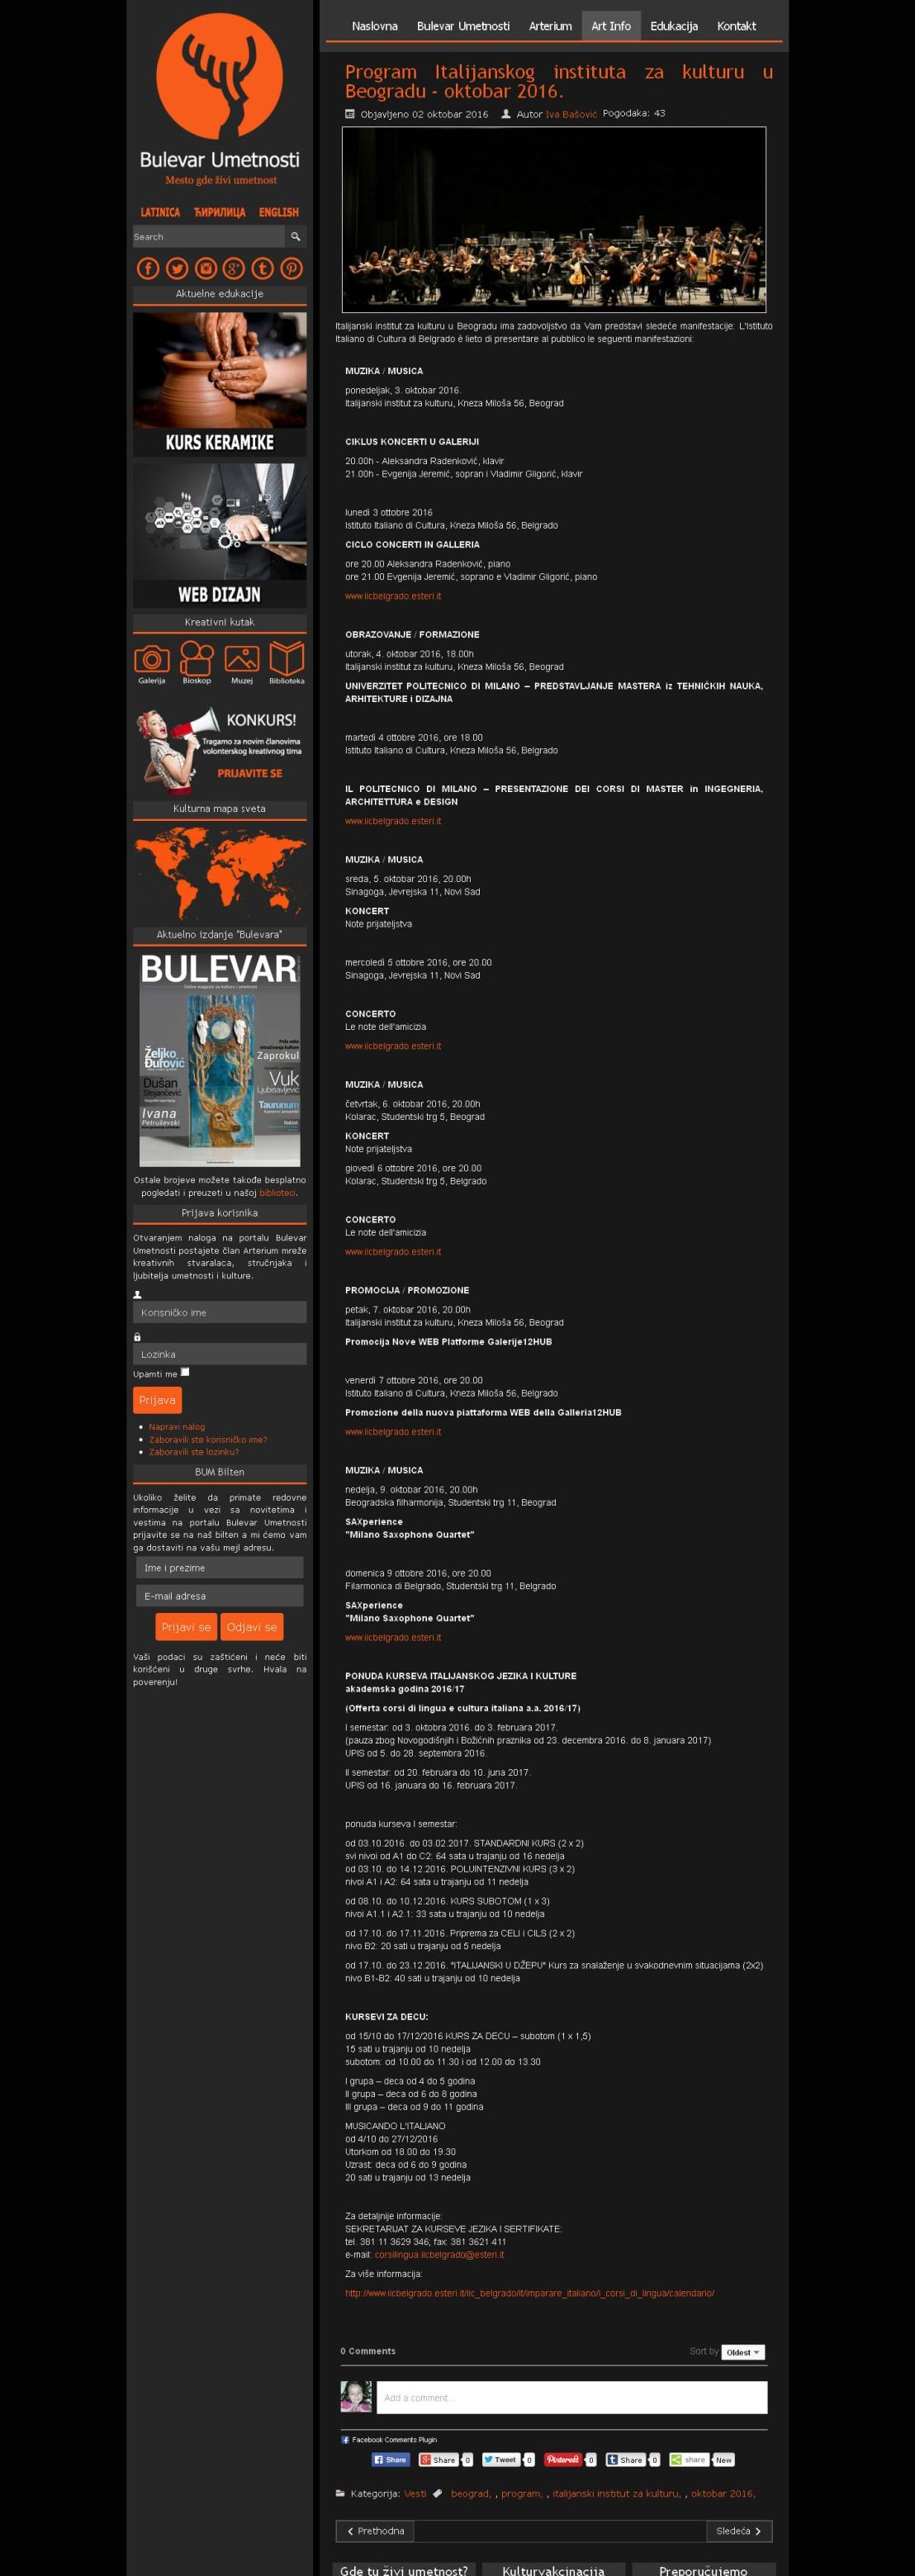 0210 - bulevarumetnosti.rs - Program Italijanskog instituta za kulturu u Beogradu - oktobar 2016..jpg